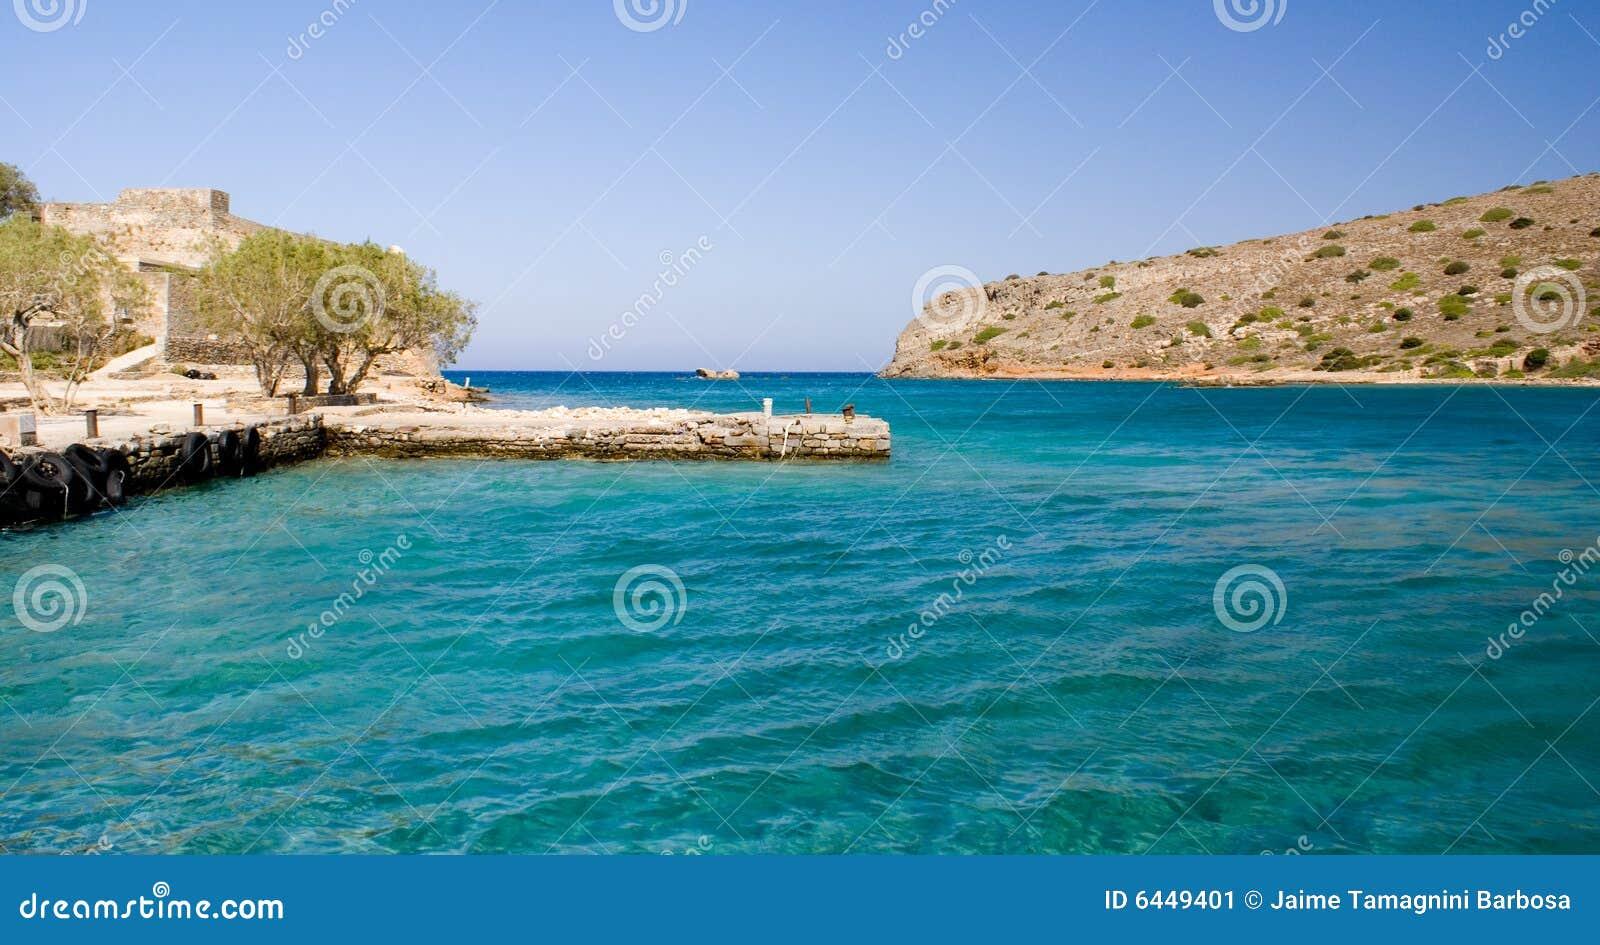 Crete varvspinilonga